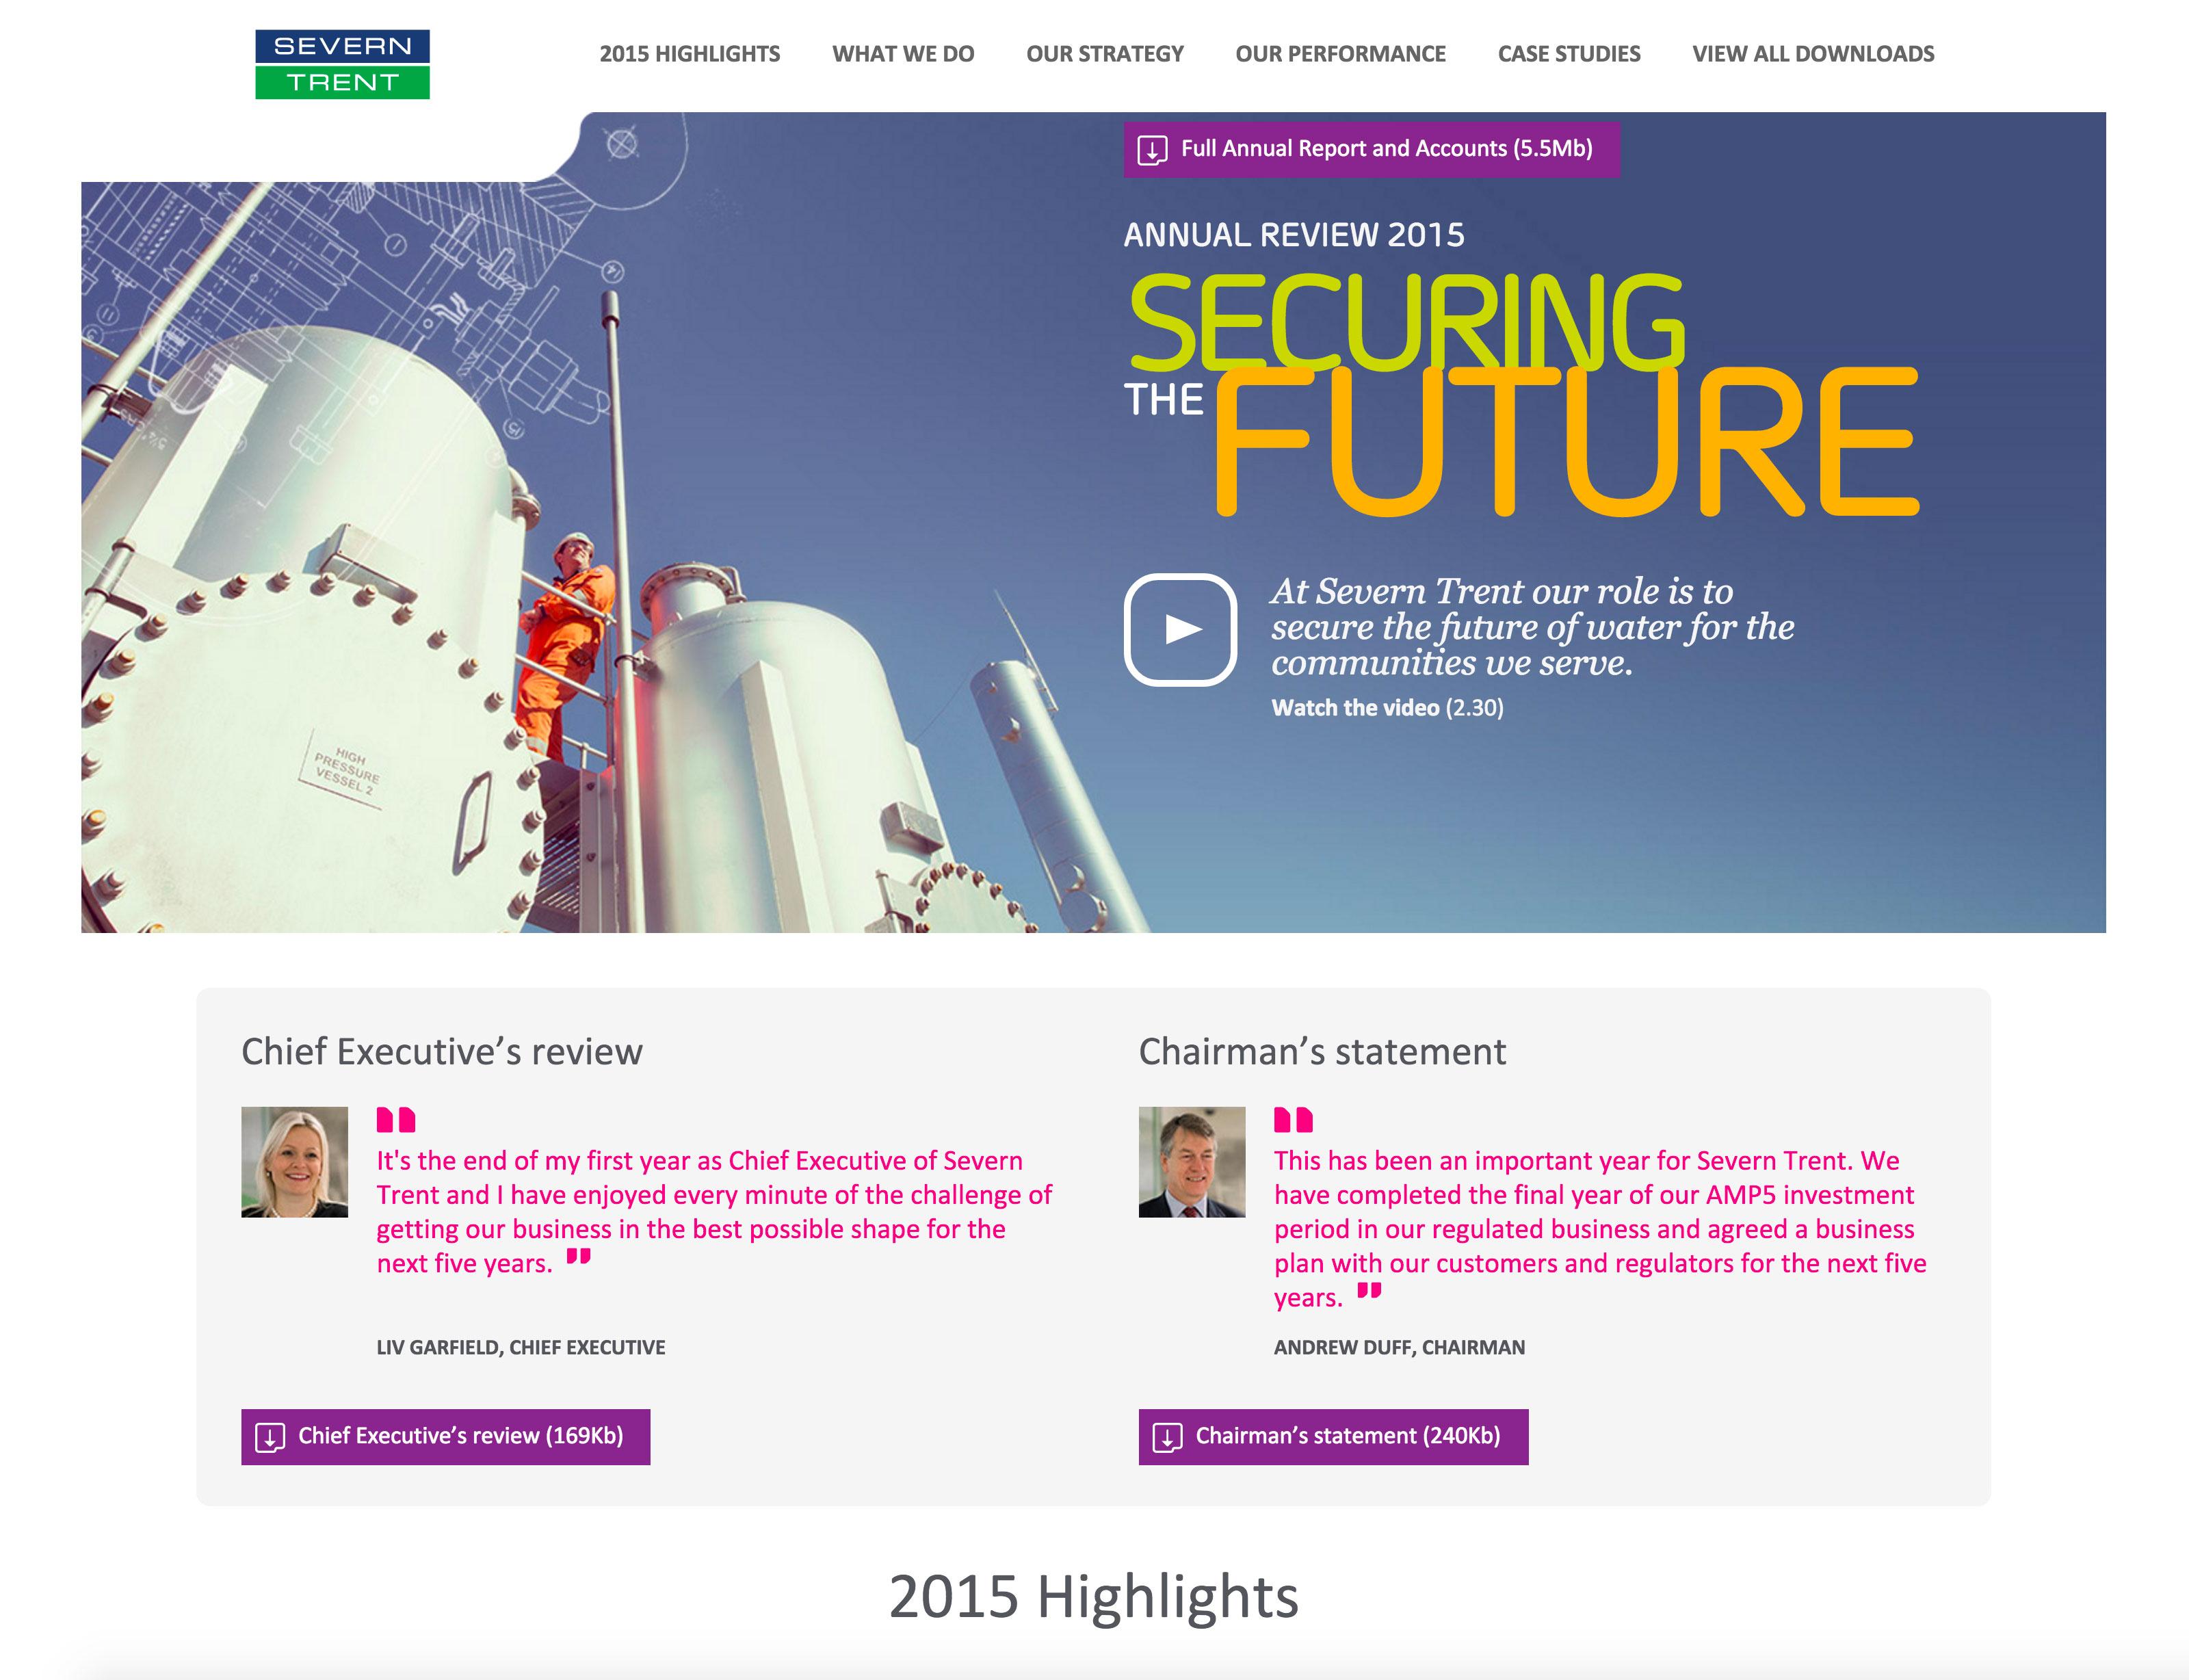 Screenshot of Severn Trent 2015 Annual Review on desktop